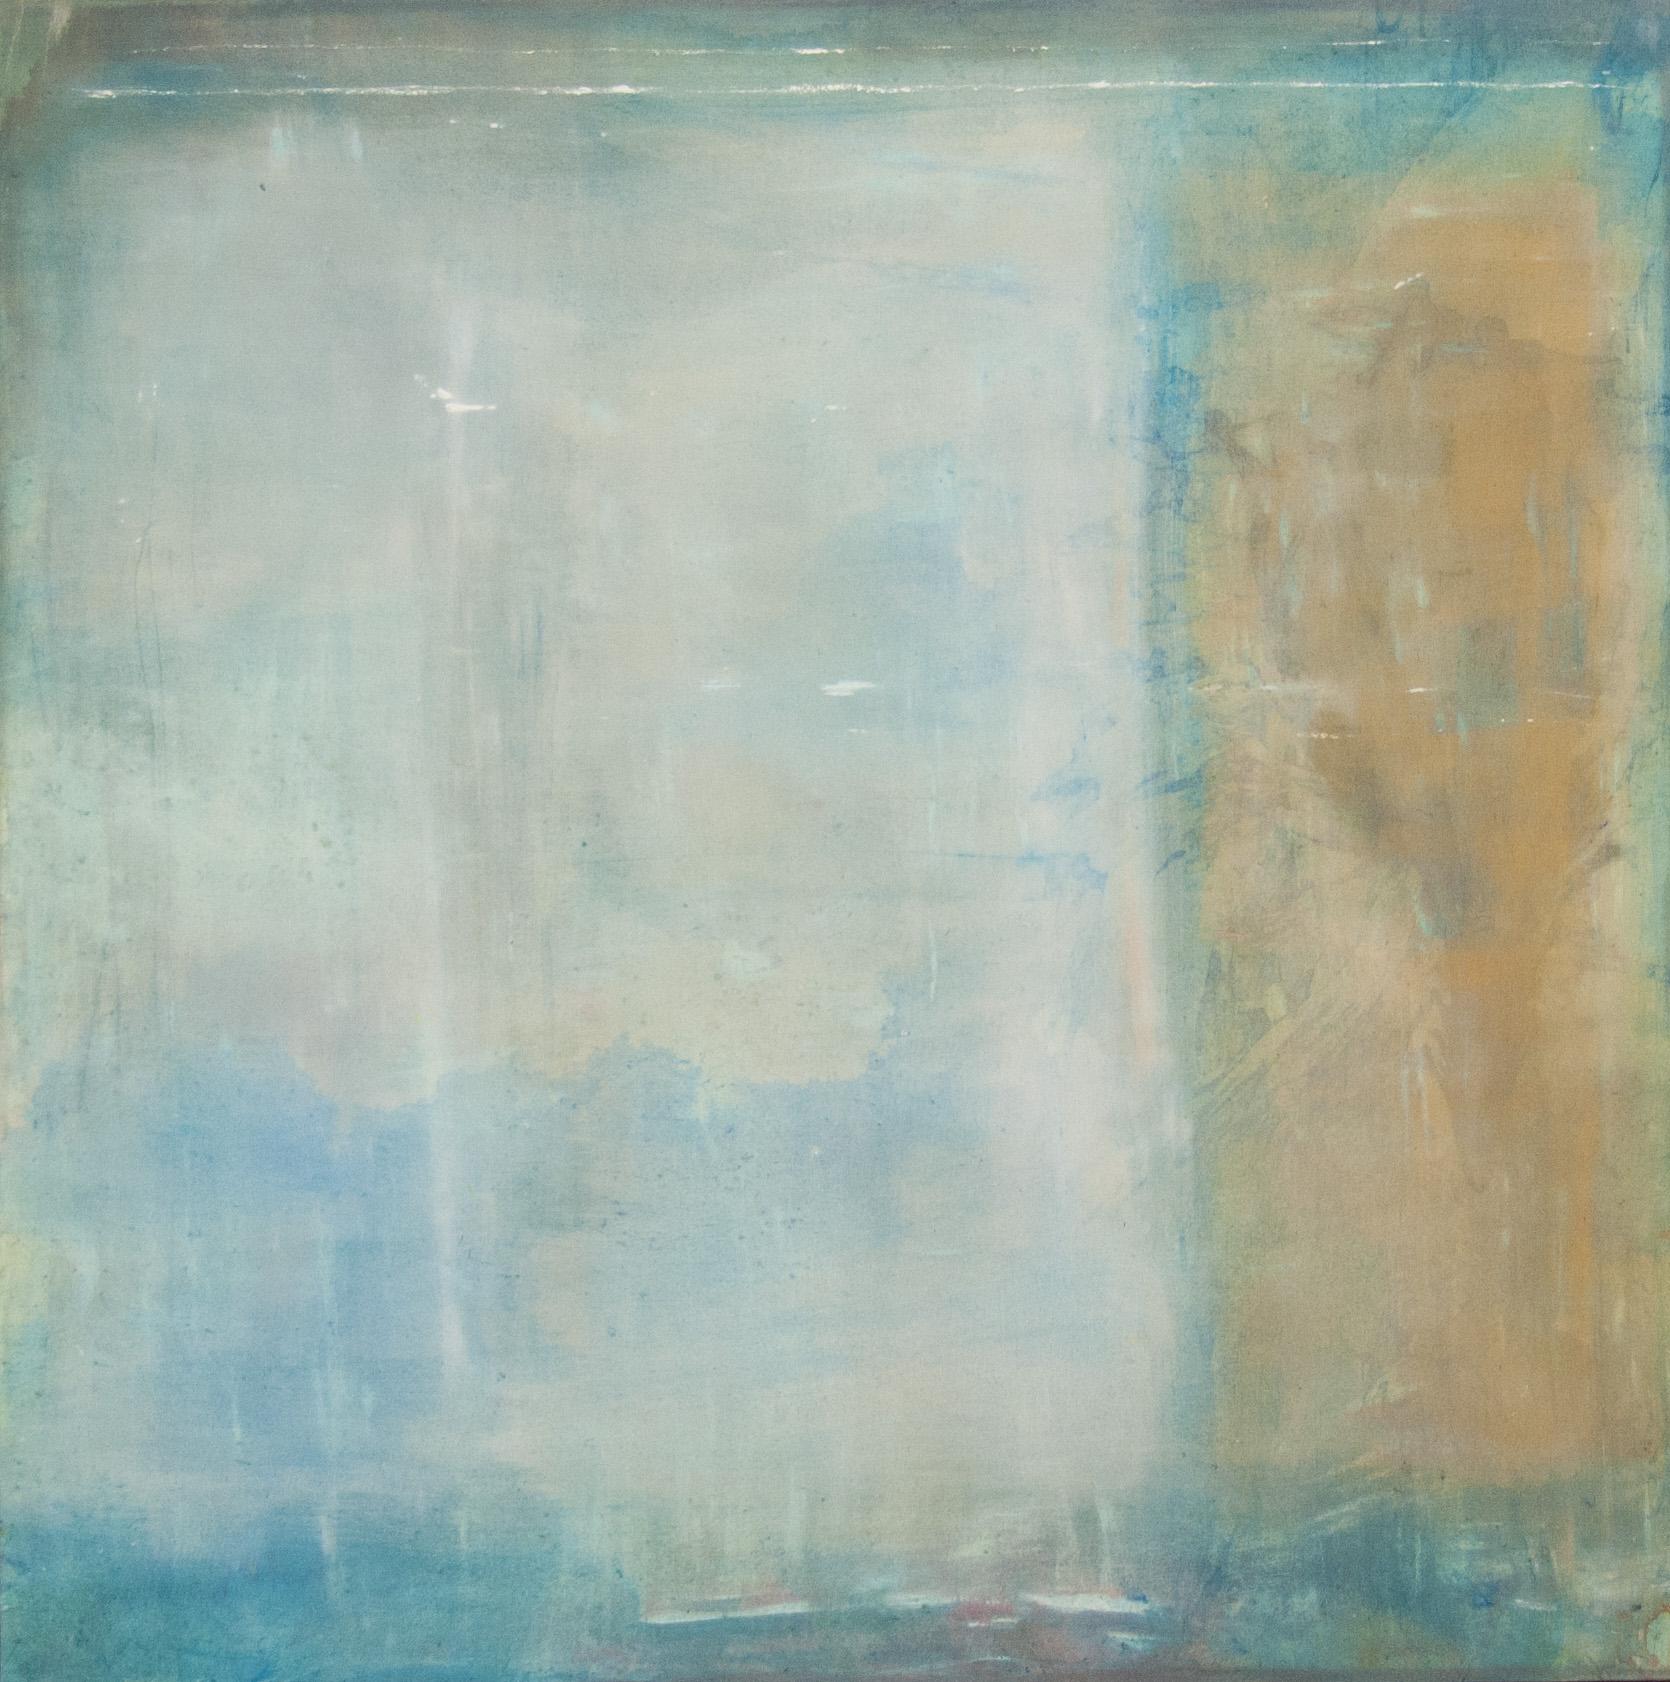 1918, Oil on Canvas, 5' x 5', $7,500